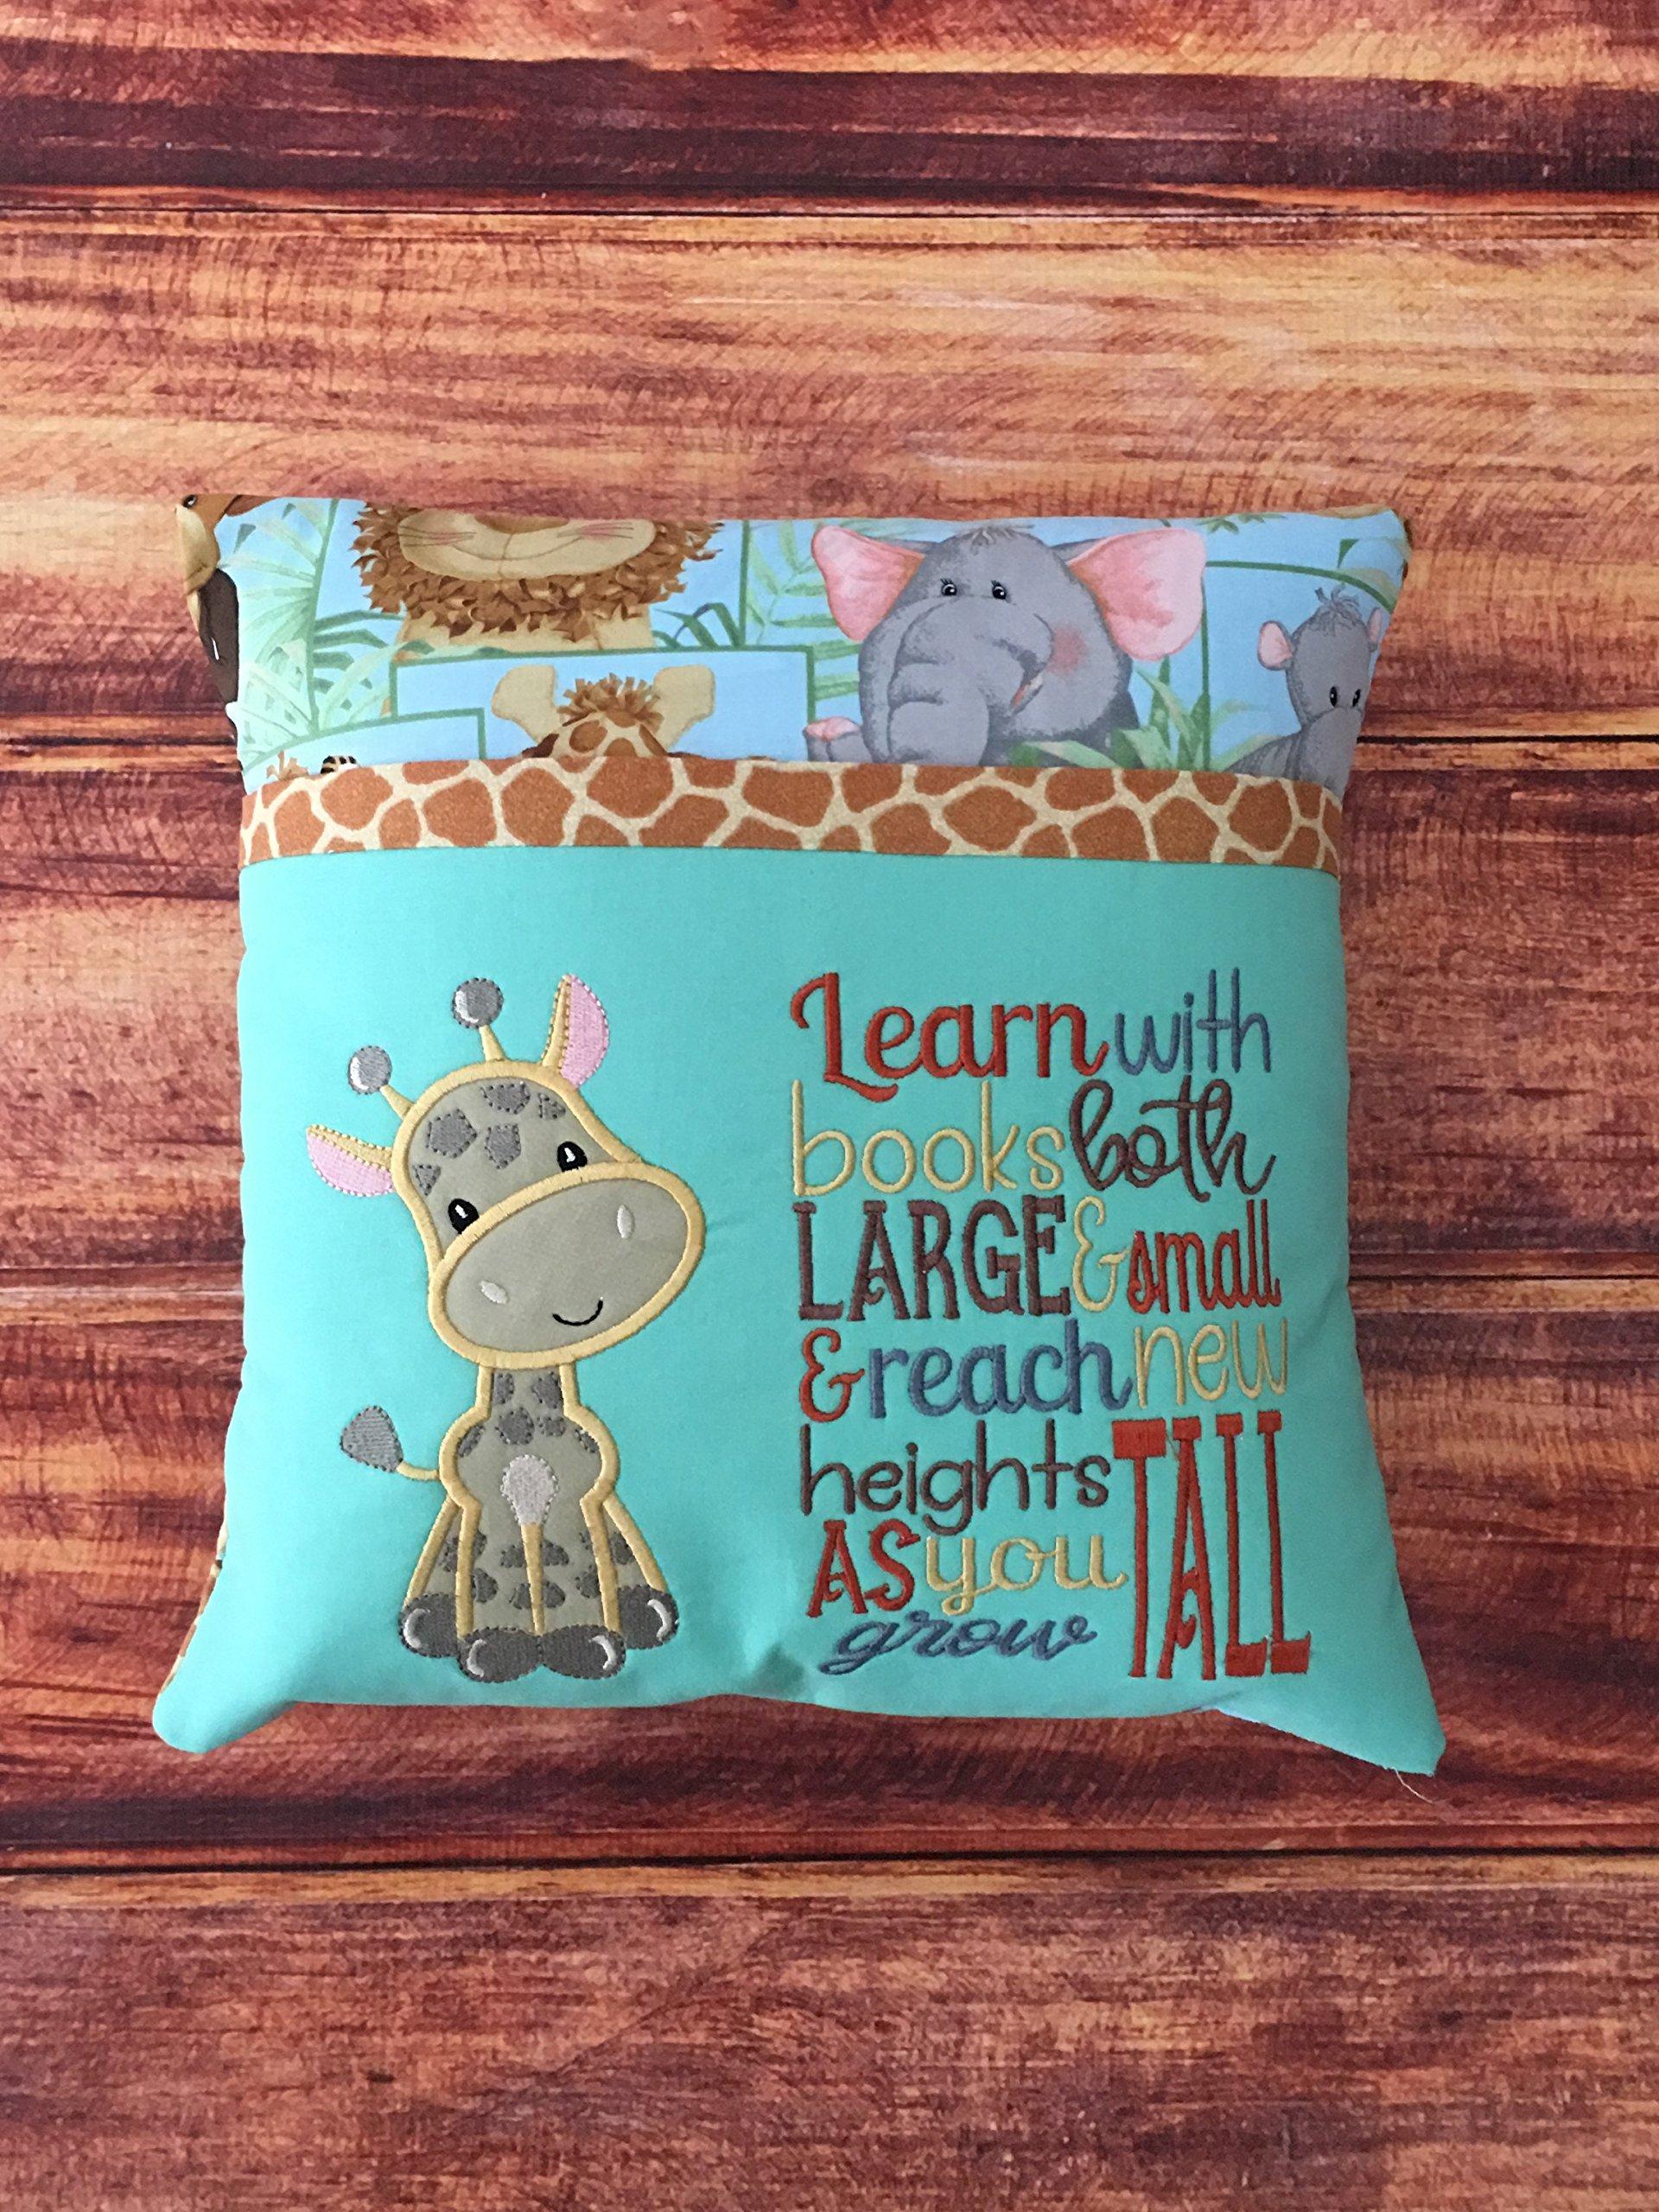 Giraffe Pillow, Animal Print Nursery Giraffe, Giraffe Baby Shower Gift, Giraffe Pillow for Toddler Room, Safari Nursery Decor, Giraffe Decor, Pillow Insert Included